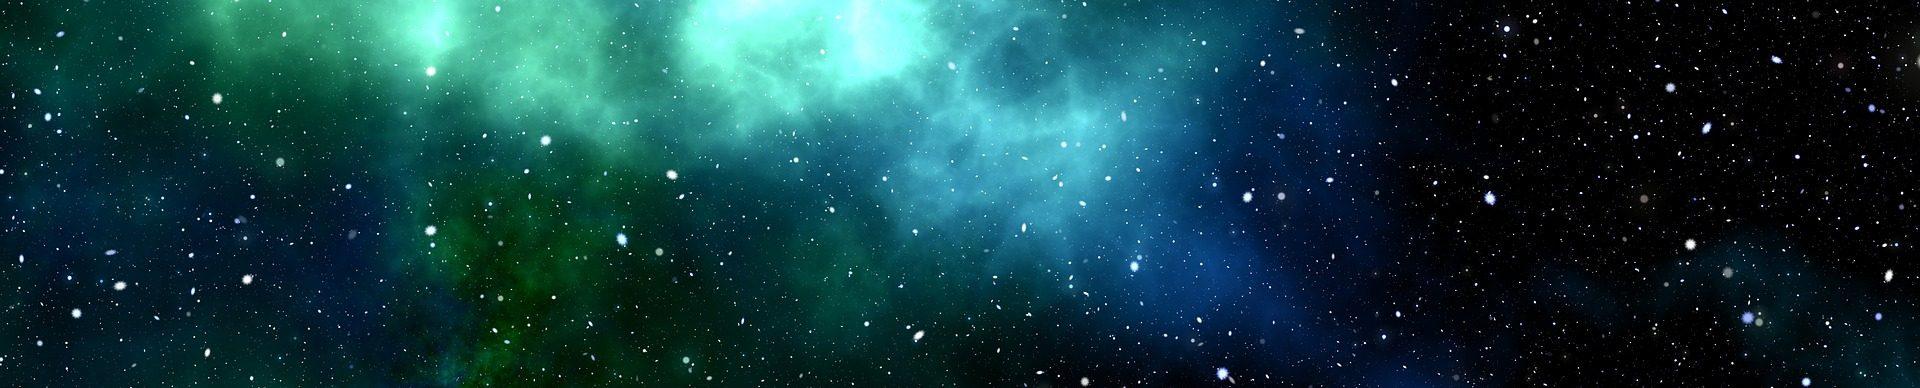 galaxy-2643089_1920 pixabay